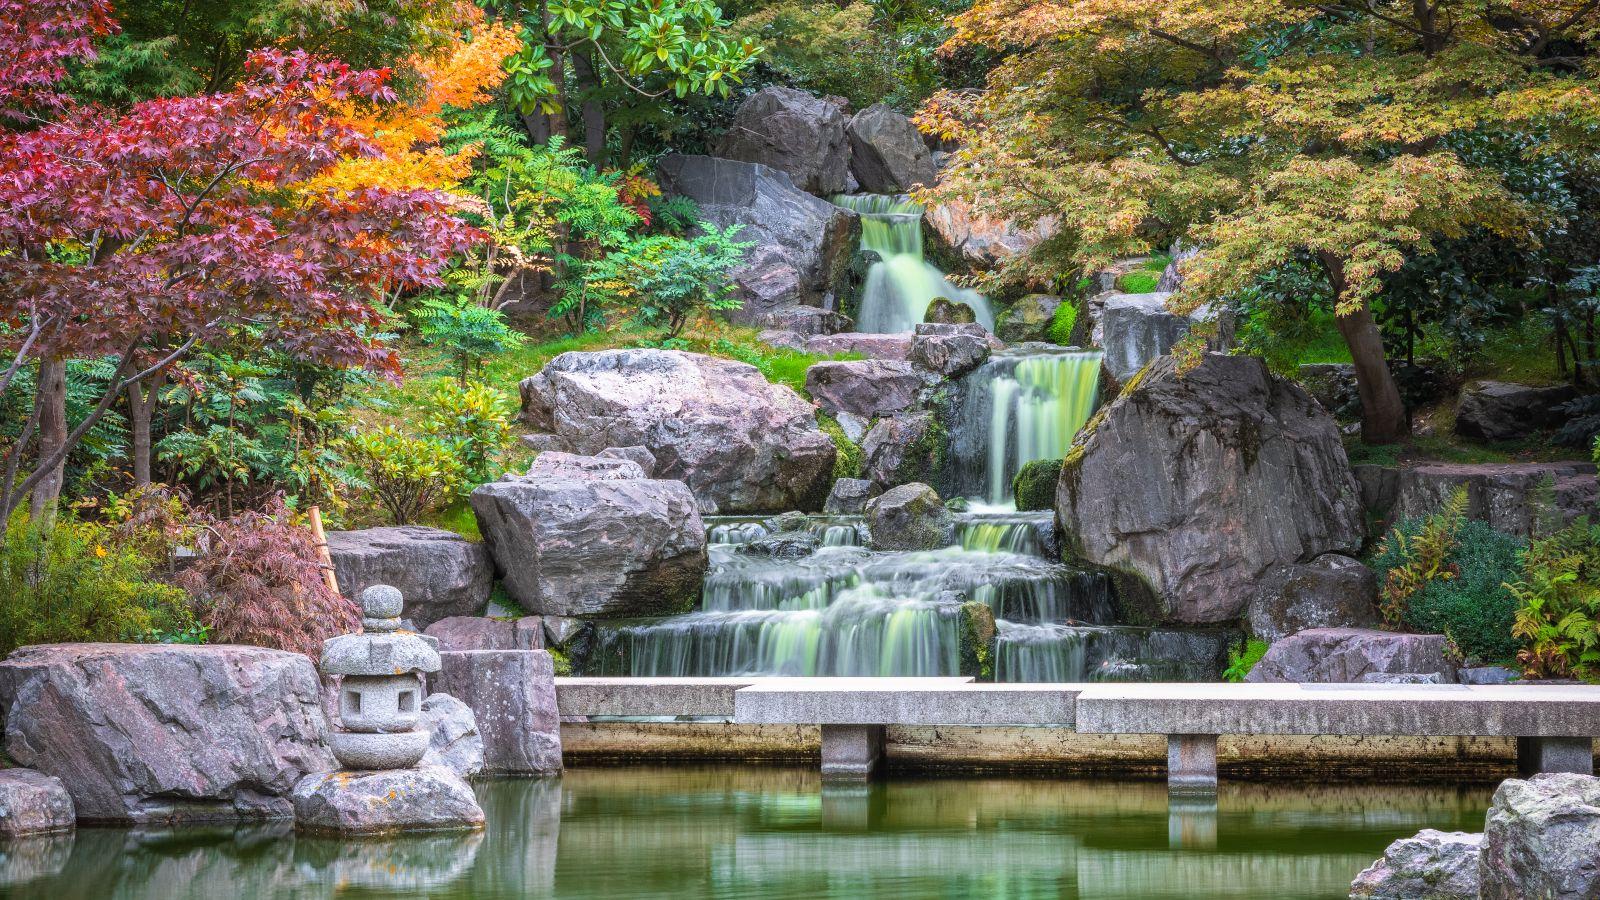 holland park waterfall